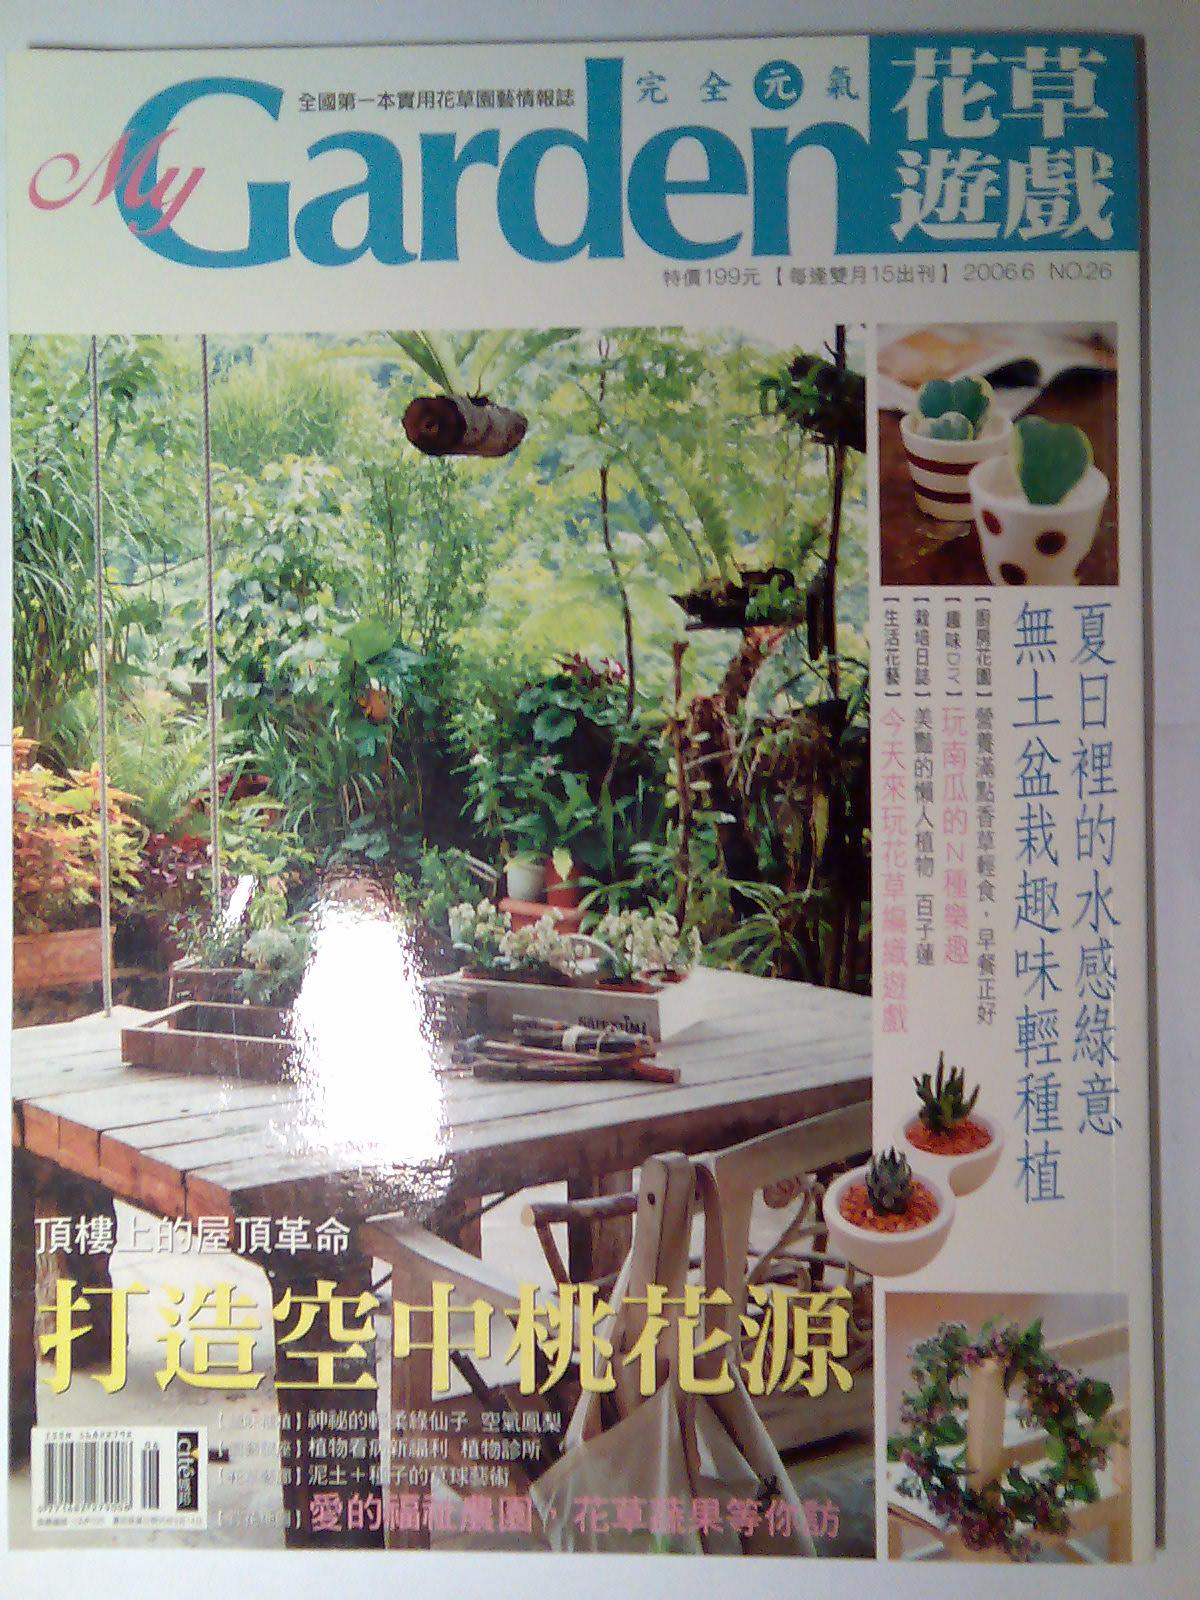 My Garden完全元氣花草遊戲